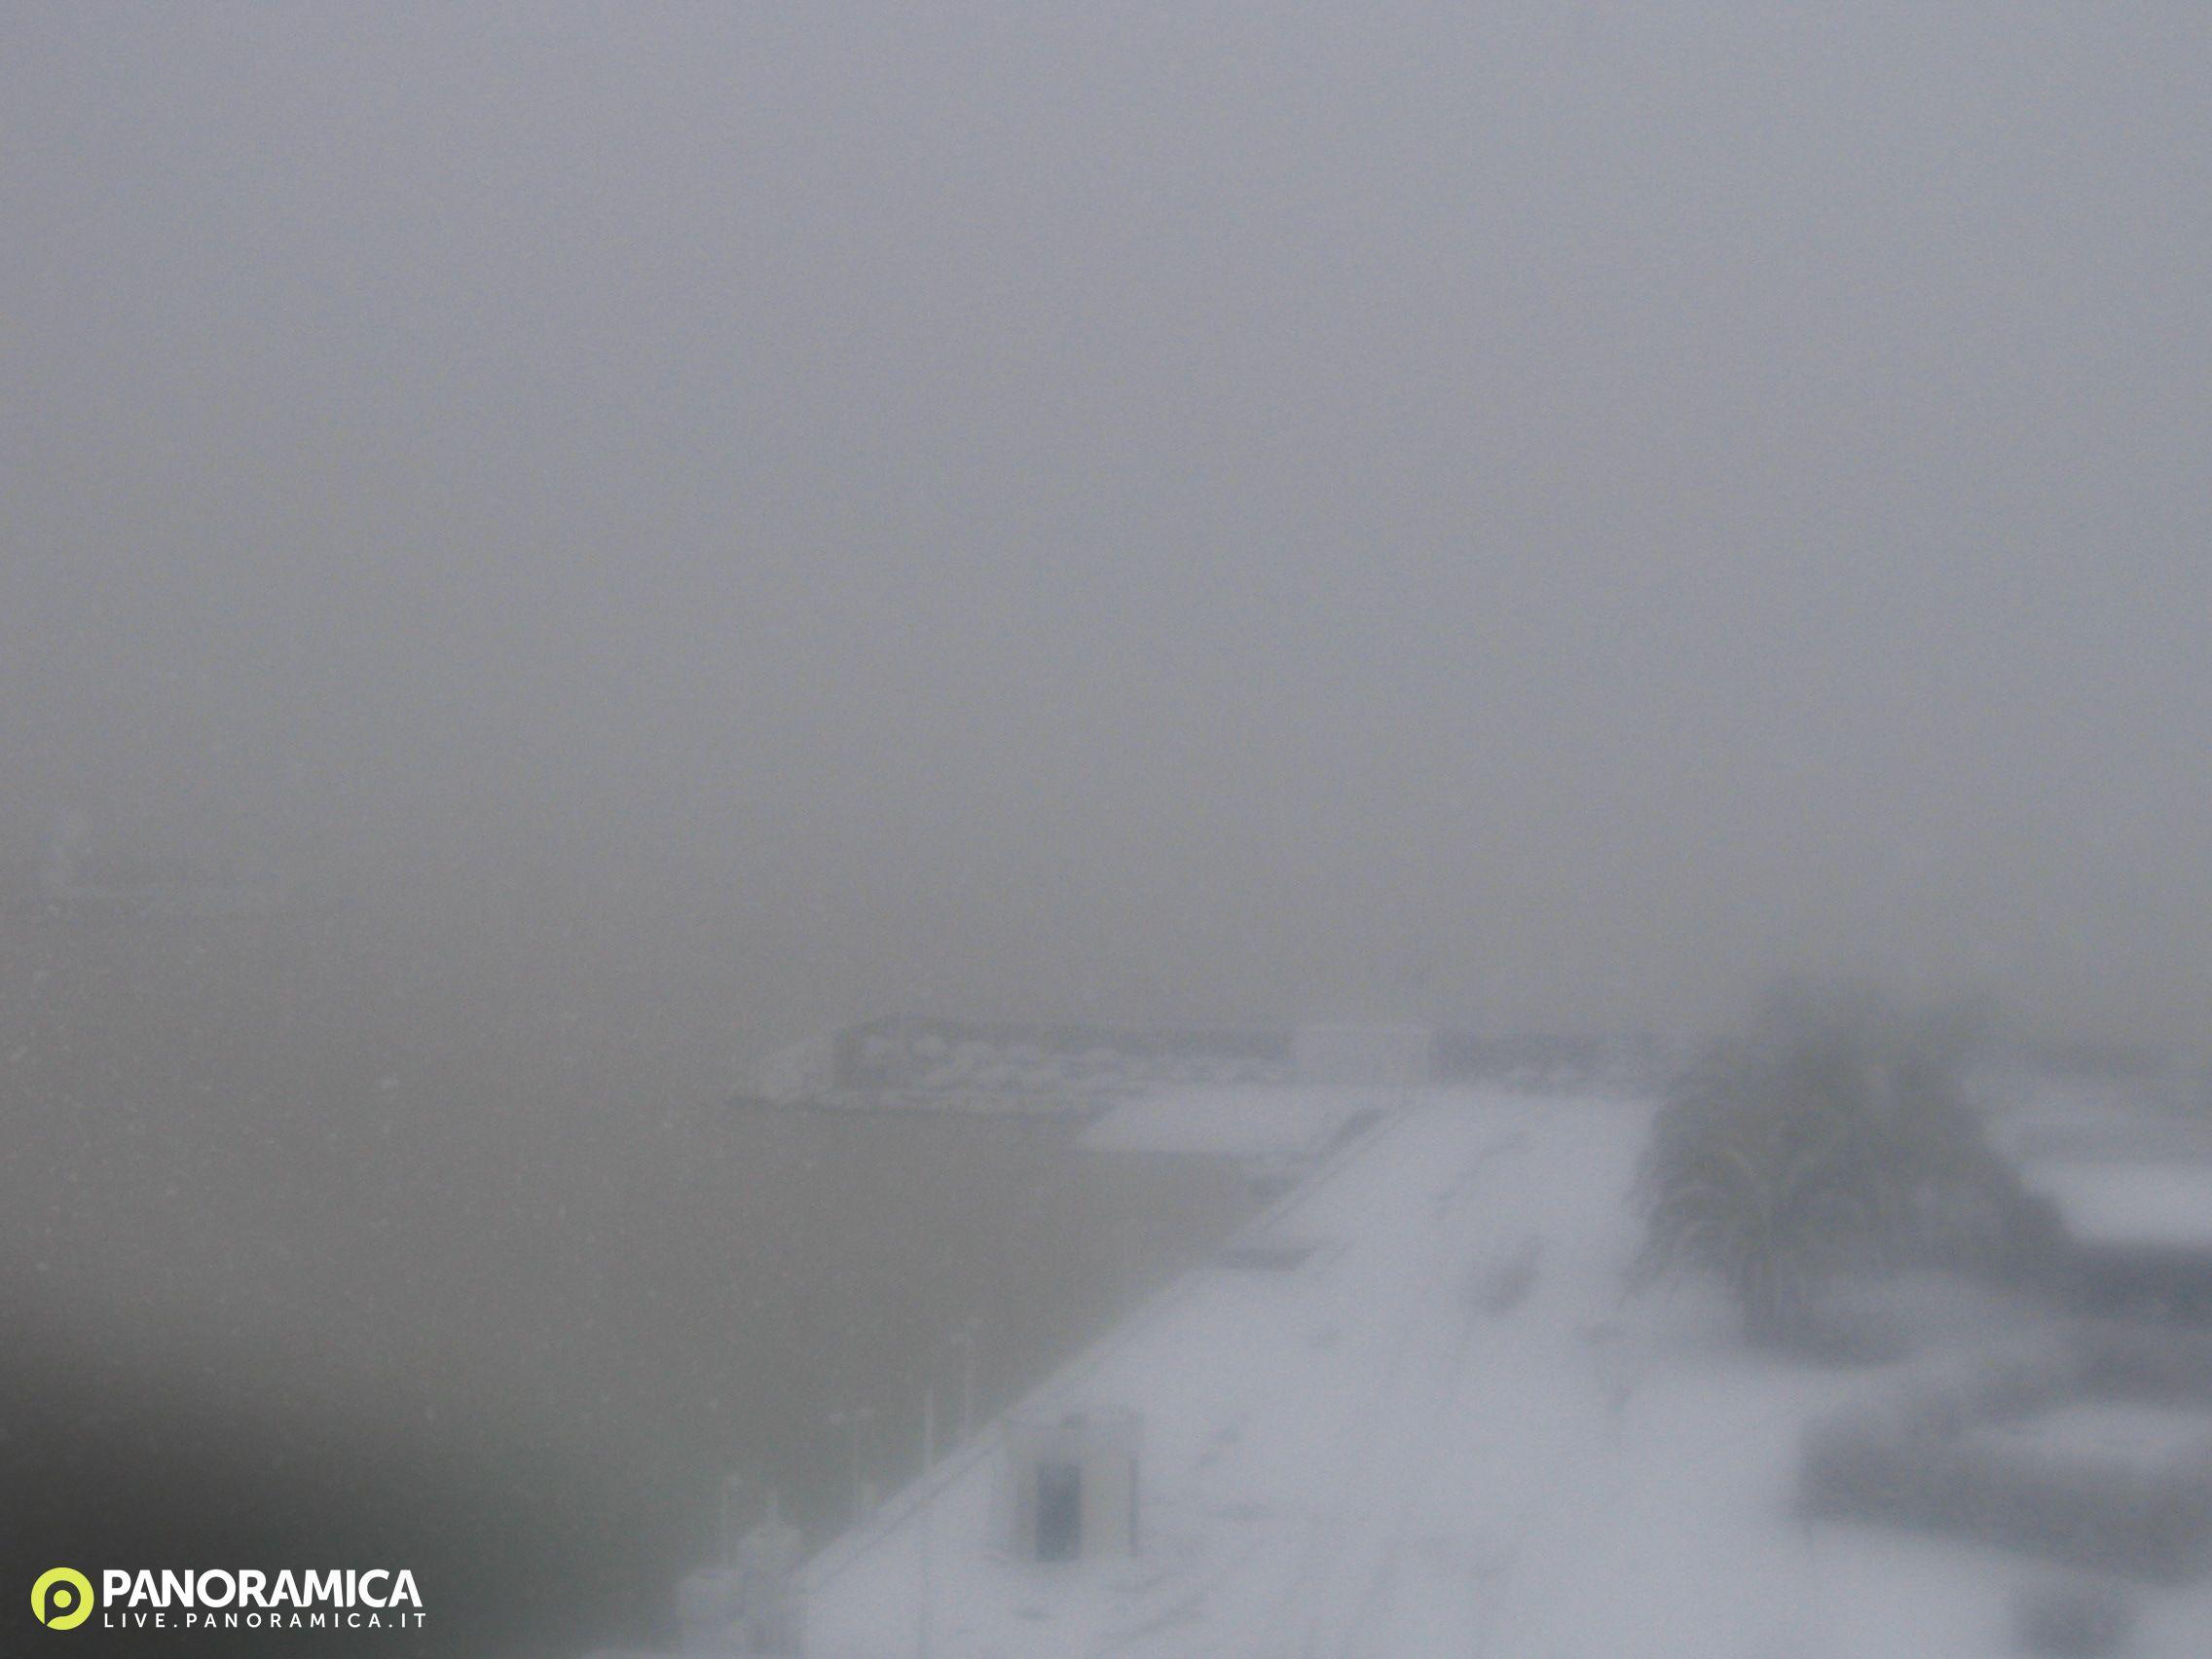 Pescara Camera Live : Pescara live panoramica.it: foto del 26 02 2018 10:00